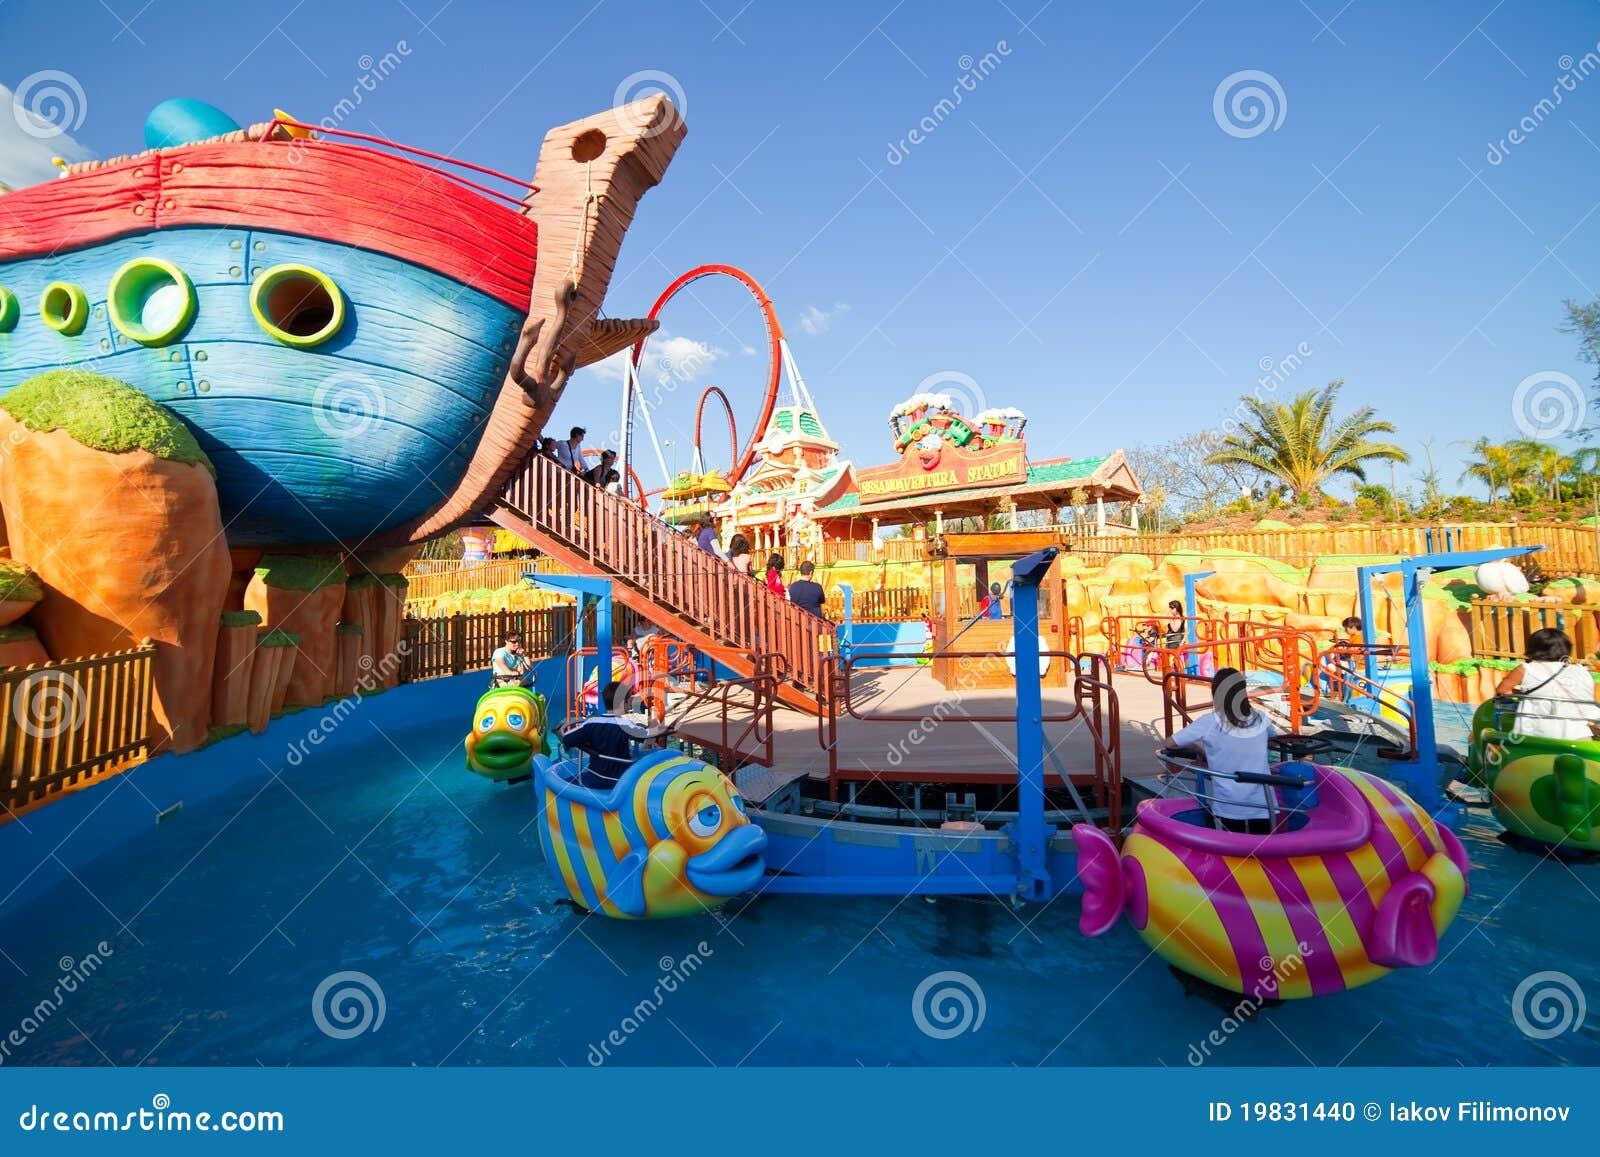 Sesame Street Area At Port Aventura Theme Park Editorial Image - Image ...